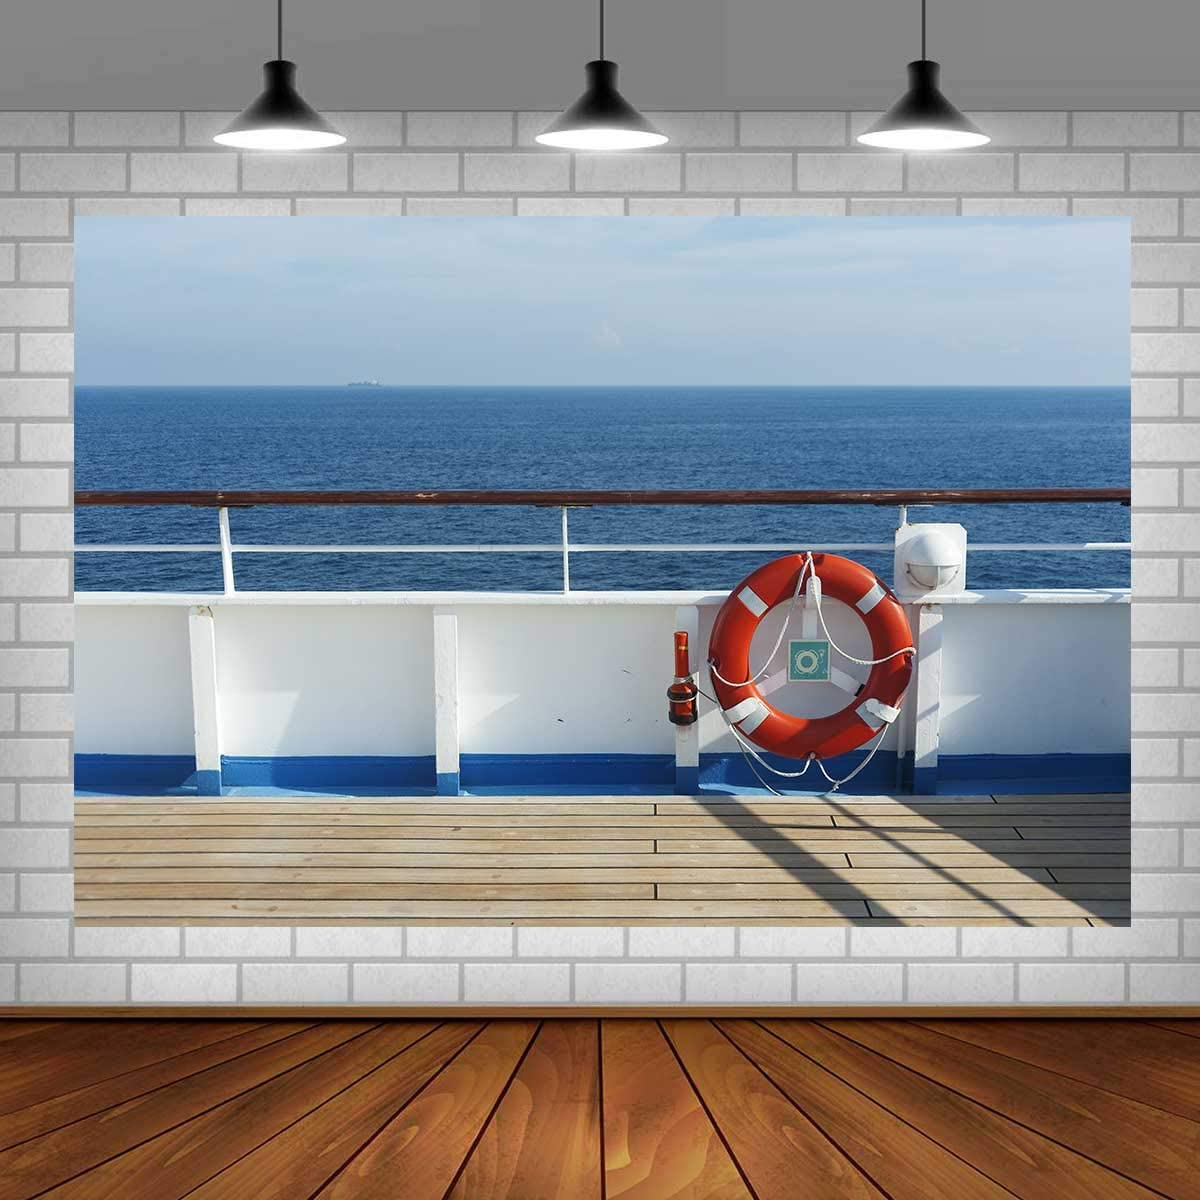 7x10 FT Nautical Vinyl Photography Background Backdrops,Marine Anchor with Wind Rose Ship Wheel Sailors Sea Life Ocean Adventure Background Newborn Baby Portrait Photo Studio Photobooth Props